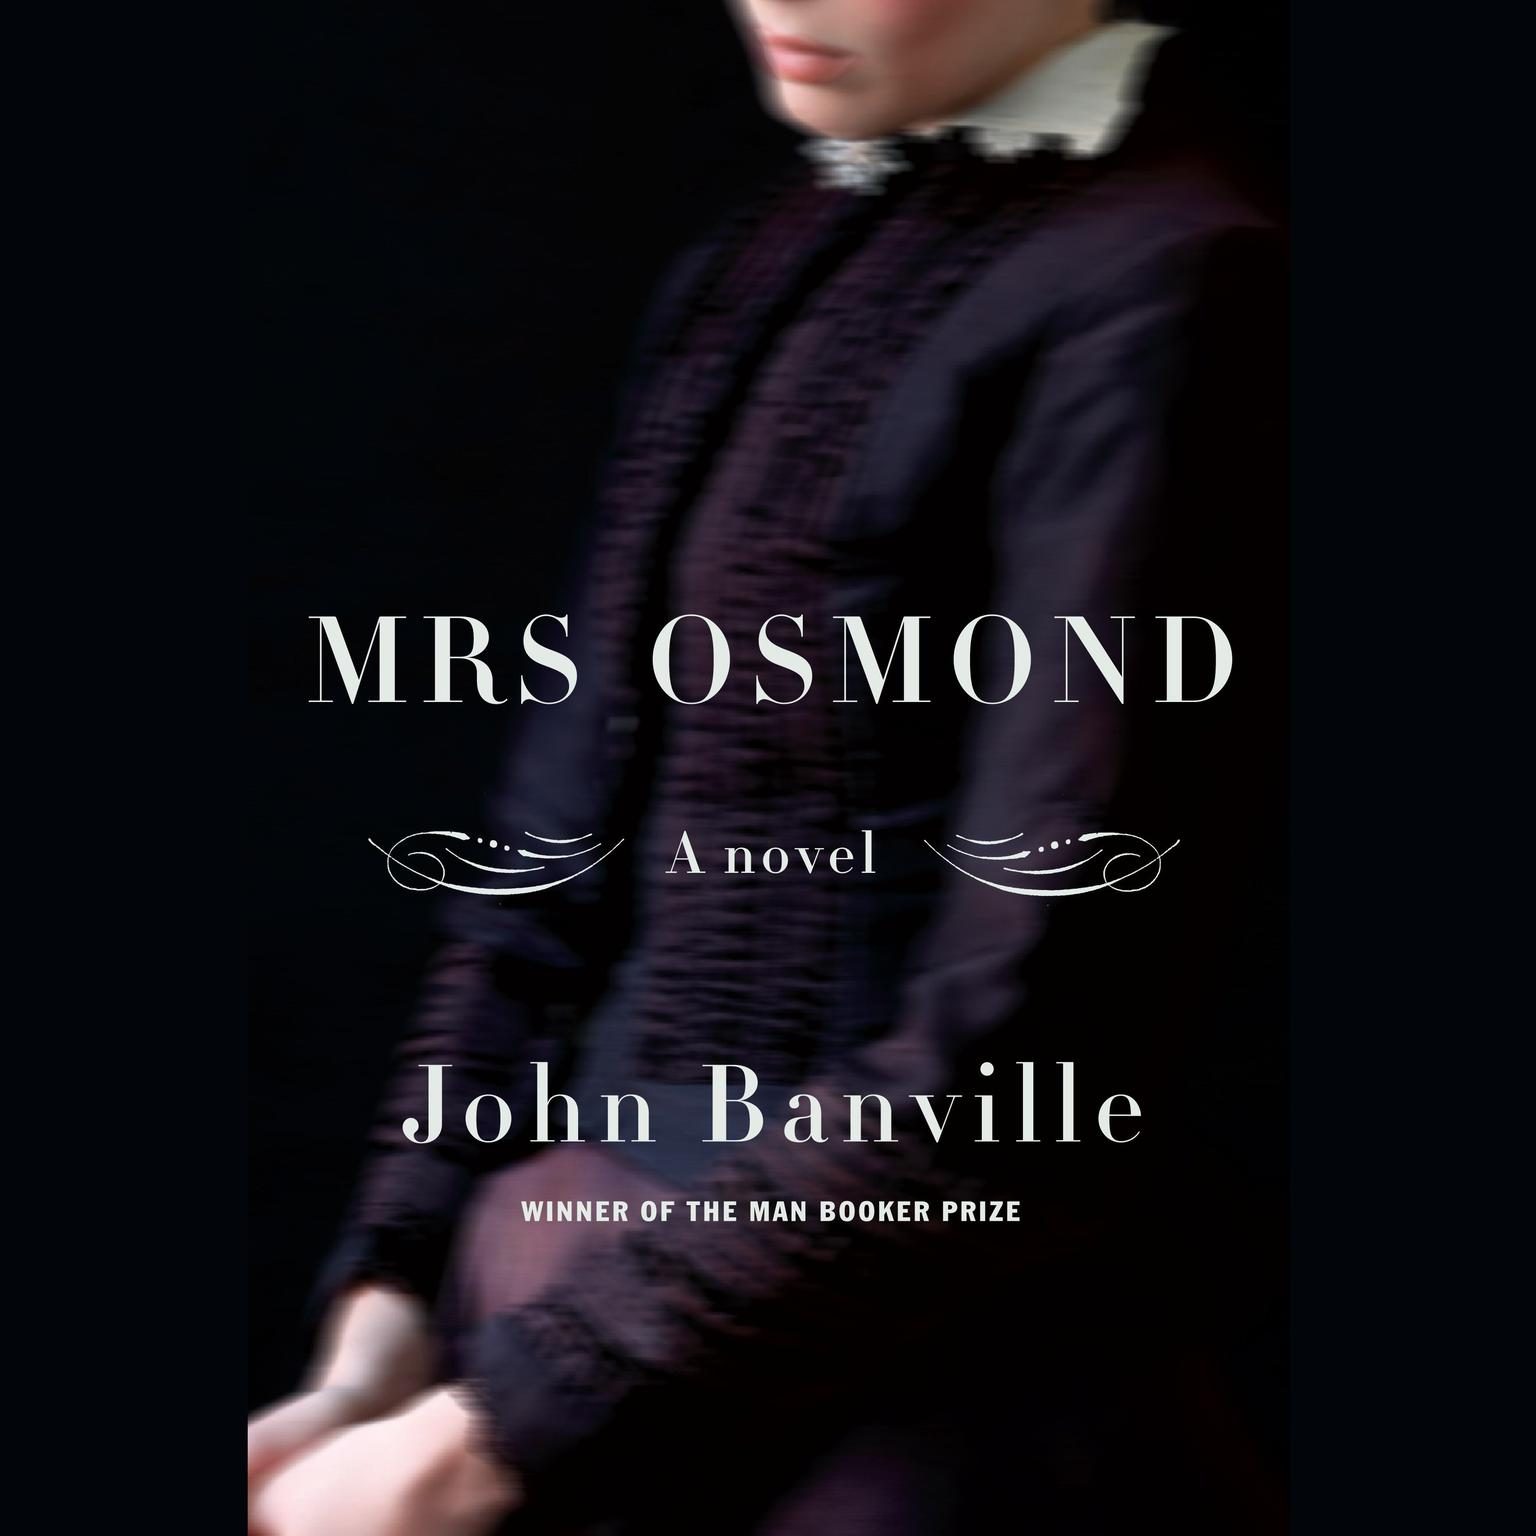 Mrs. Osmond: A novel Audiobook, by John Banville